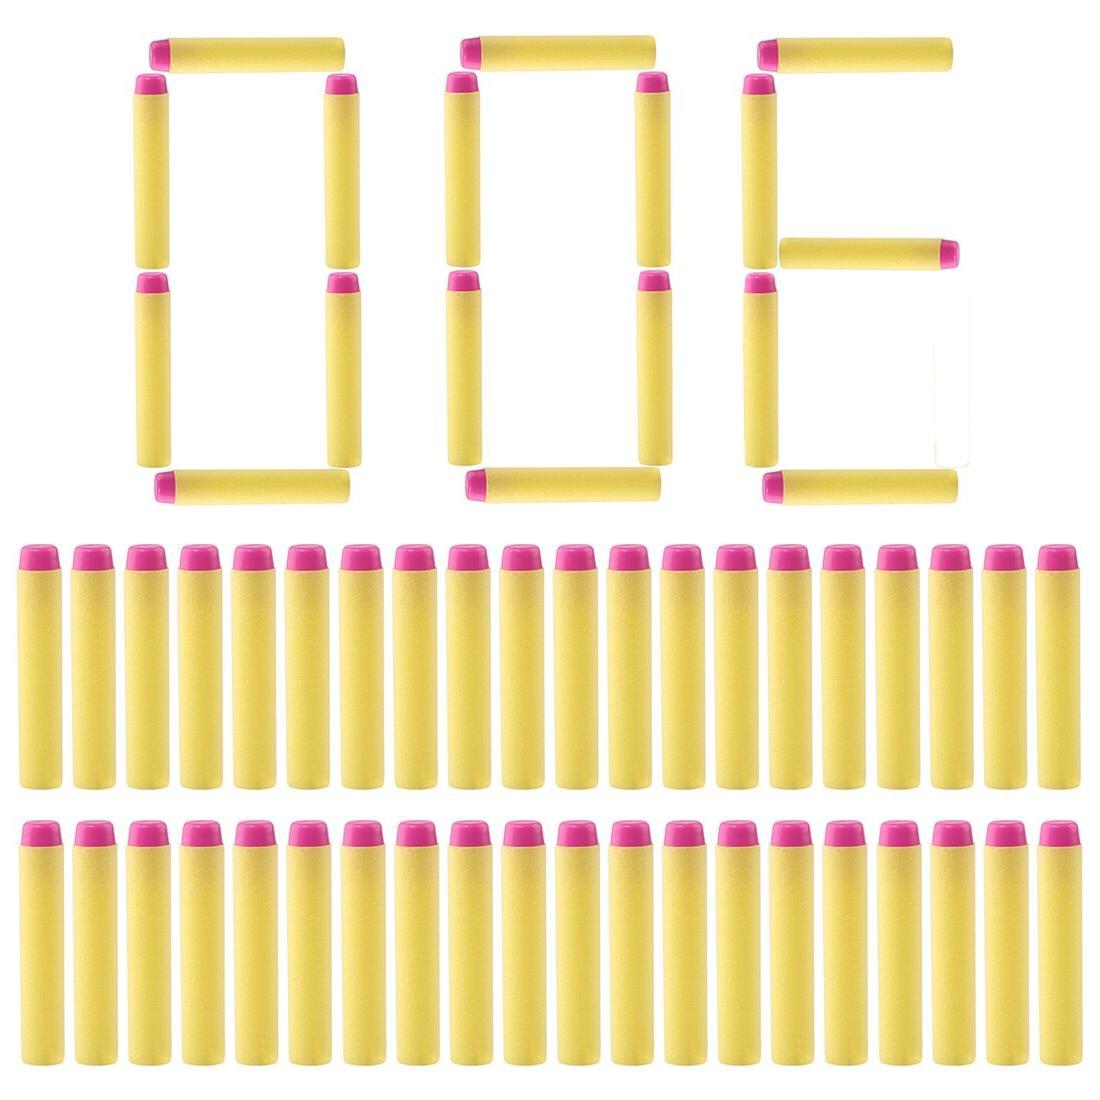 NFSTRIKE 300pcs Soft Women <font><b>Girls</b></font> Foam Bullets For Toy <font><b>Gun</b></font> Part Free